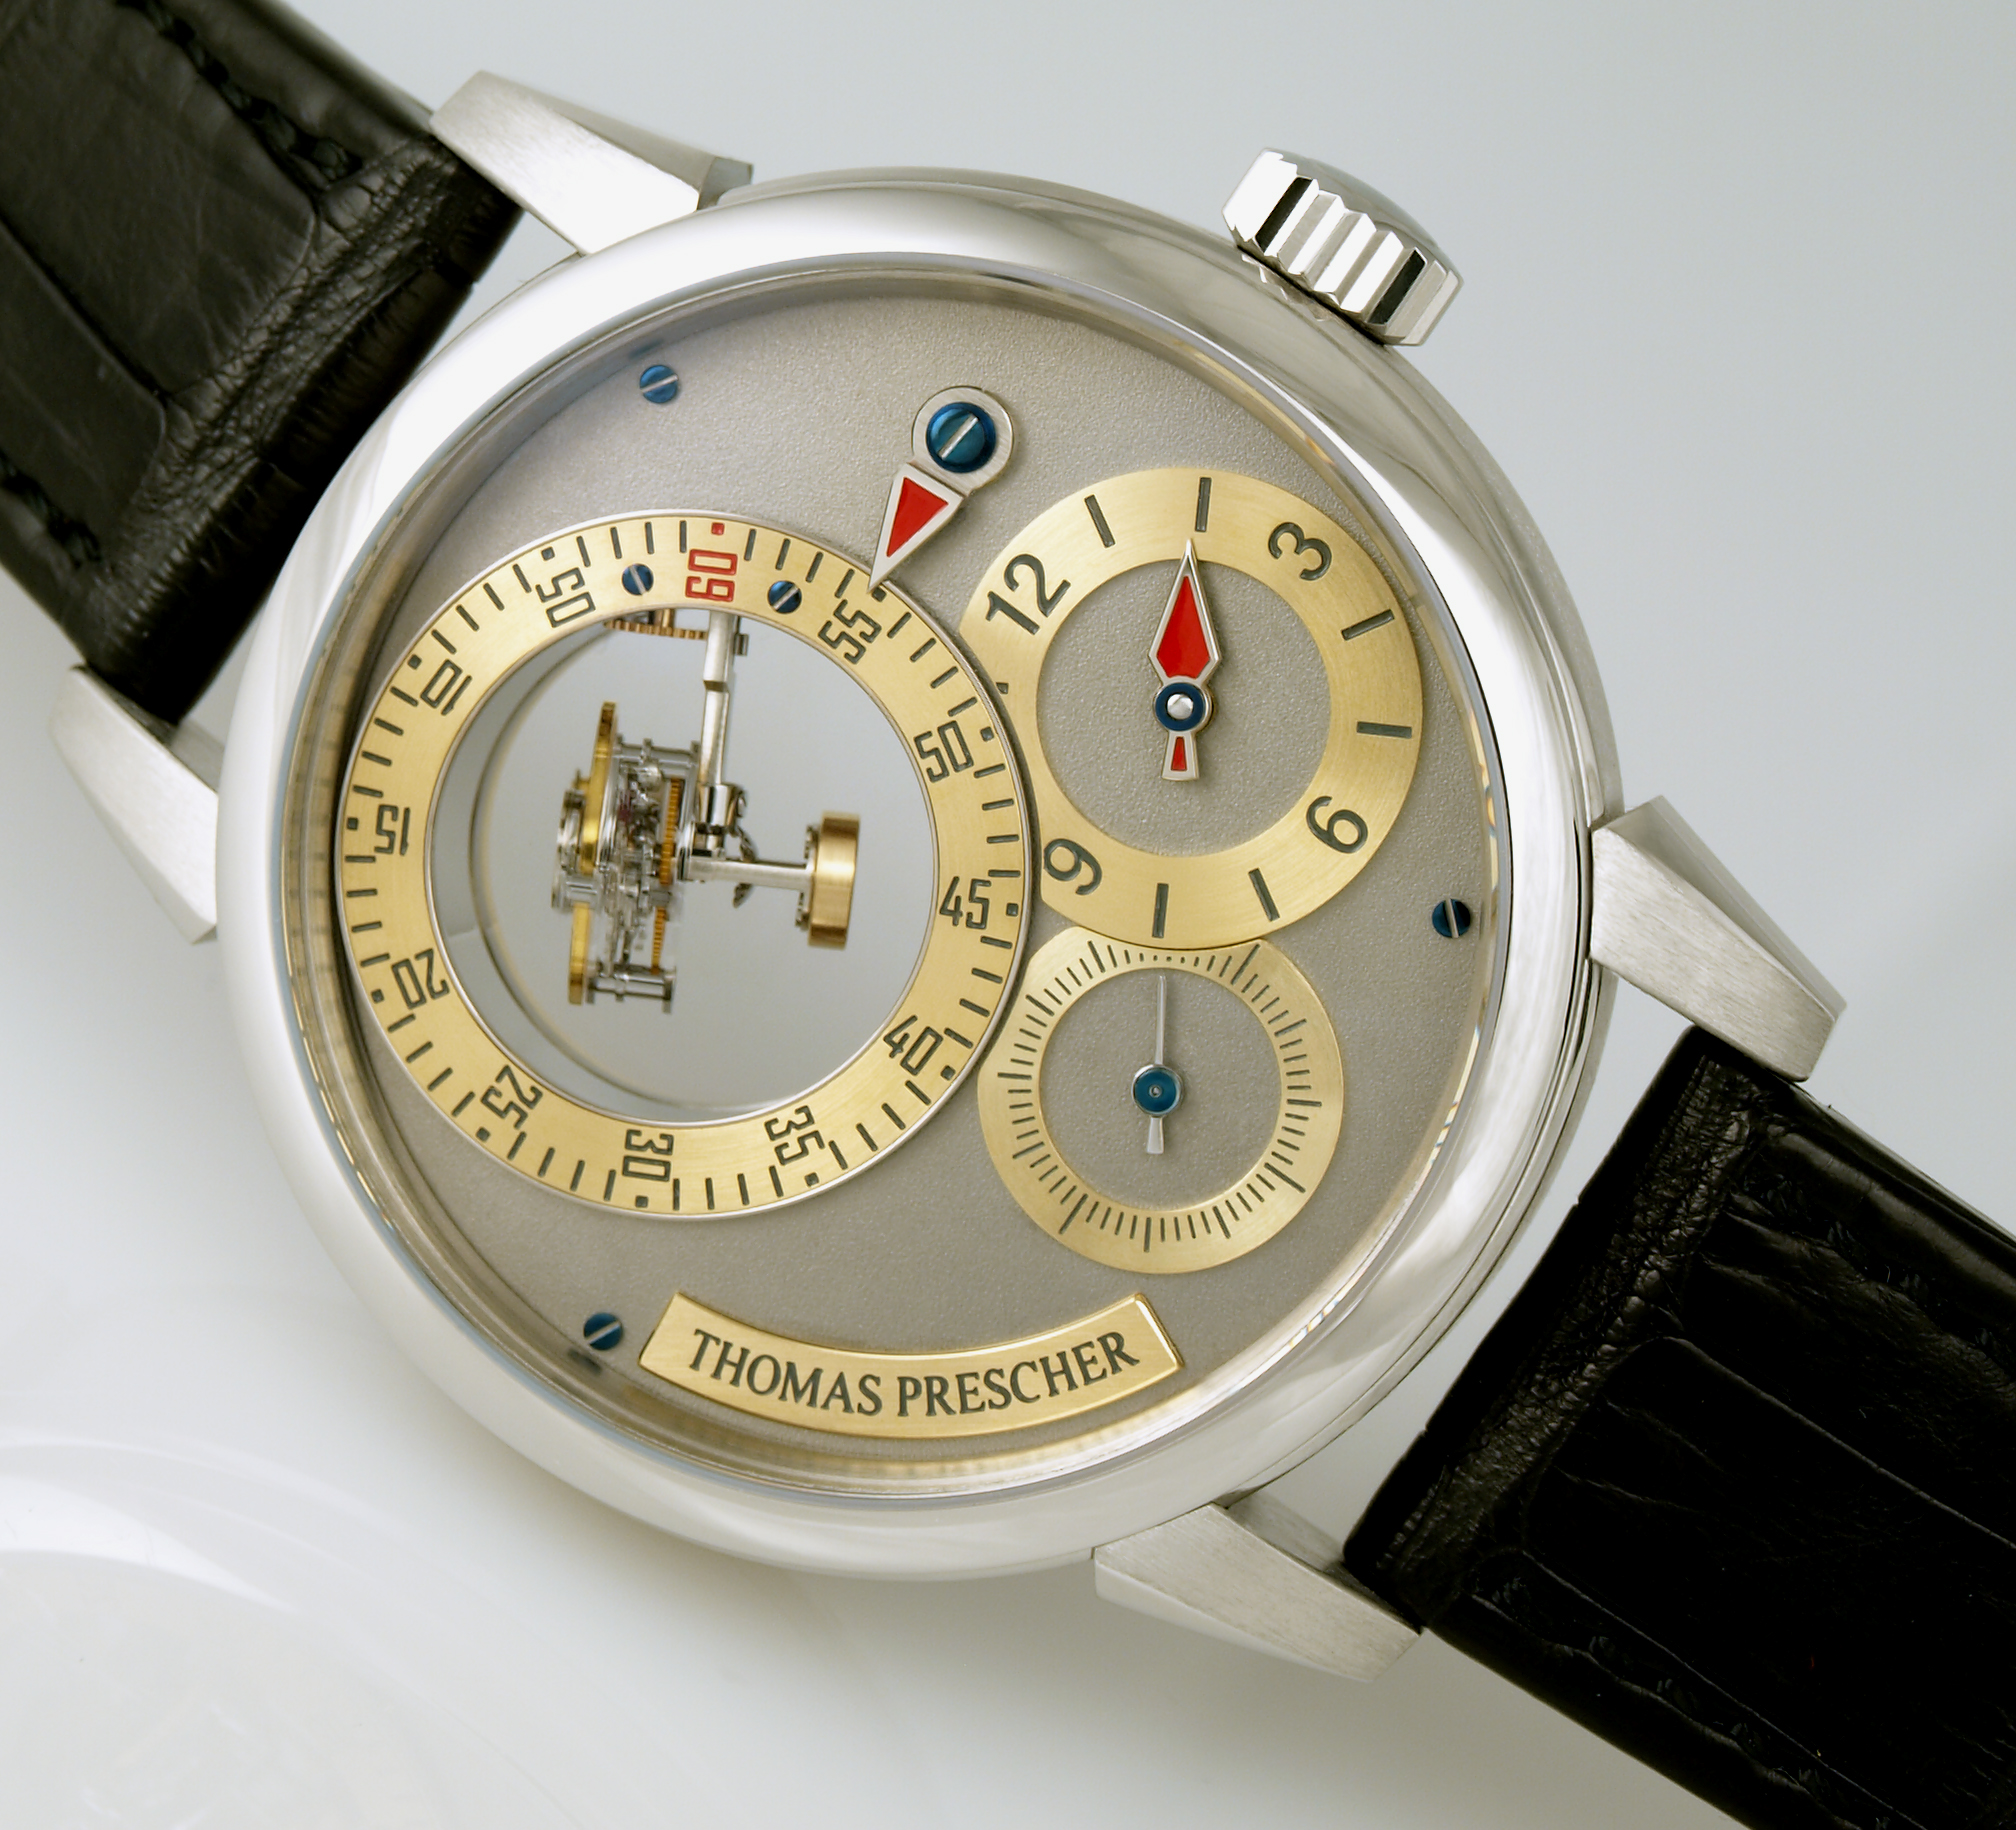 Tourbillon, Thomas Preshcer, Watch Parts, Watch Functionality, SIlver Watch, Watch History